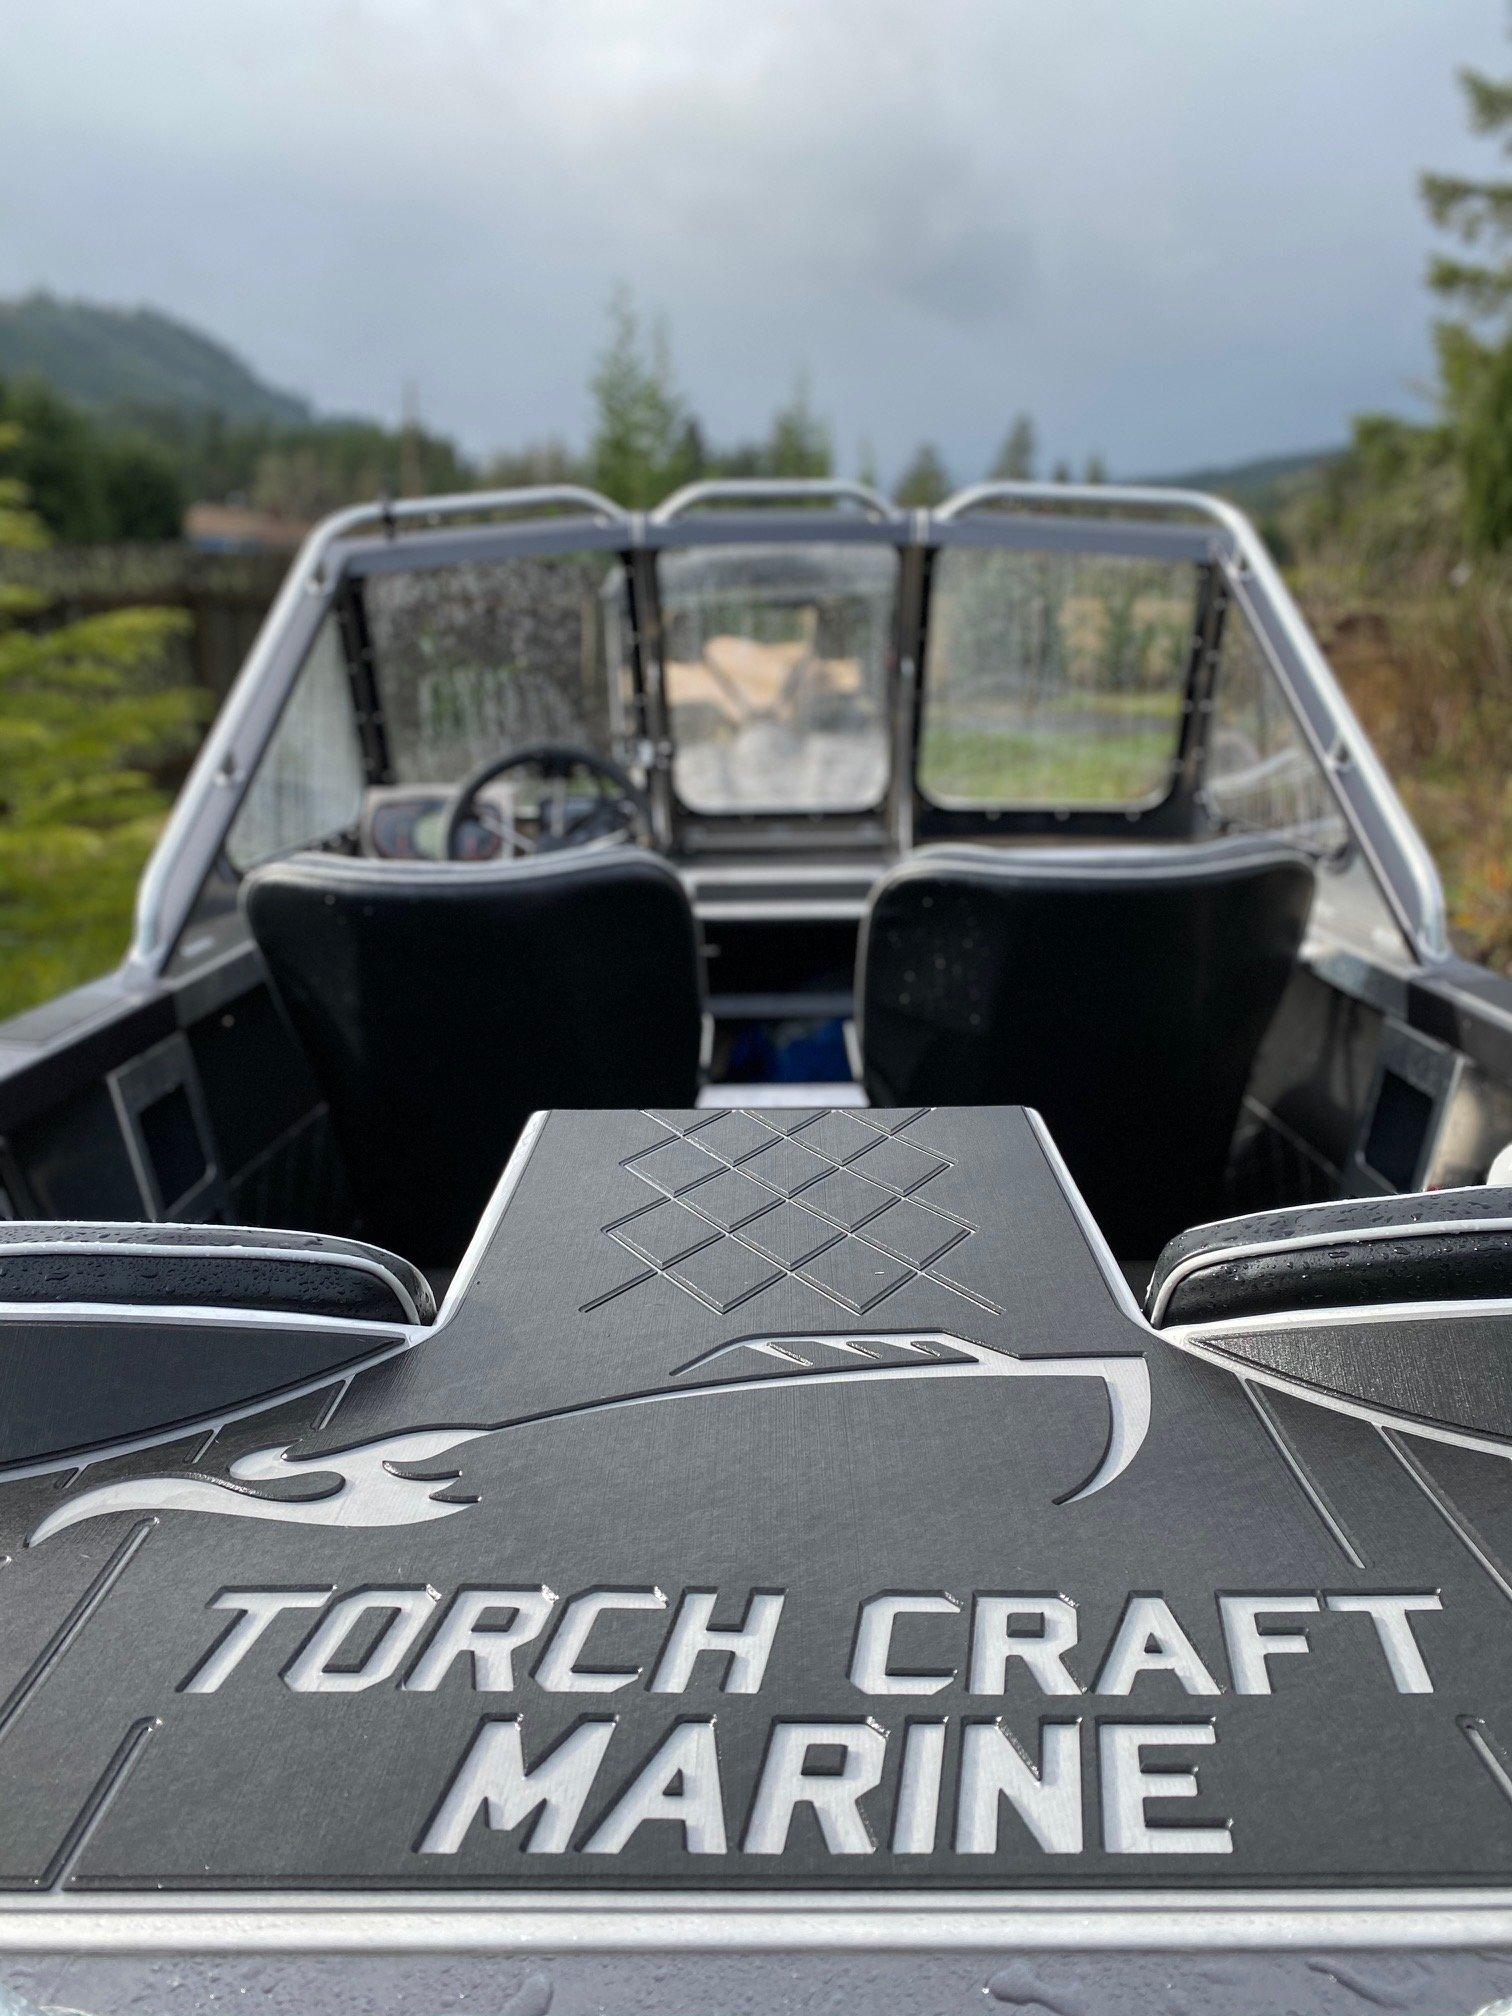 #LILBUCKY 12' 4 seater 300hp Rotax